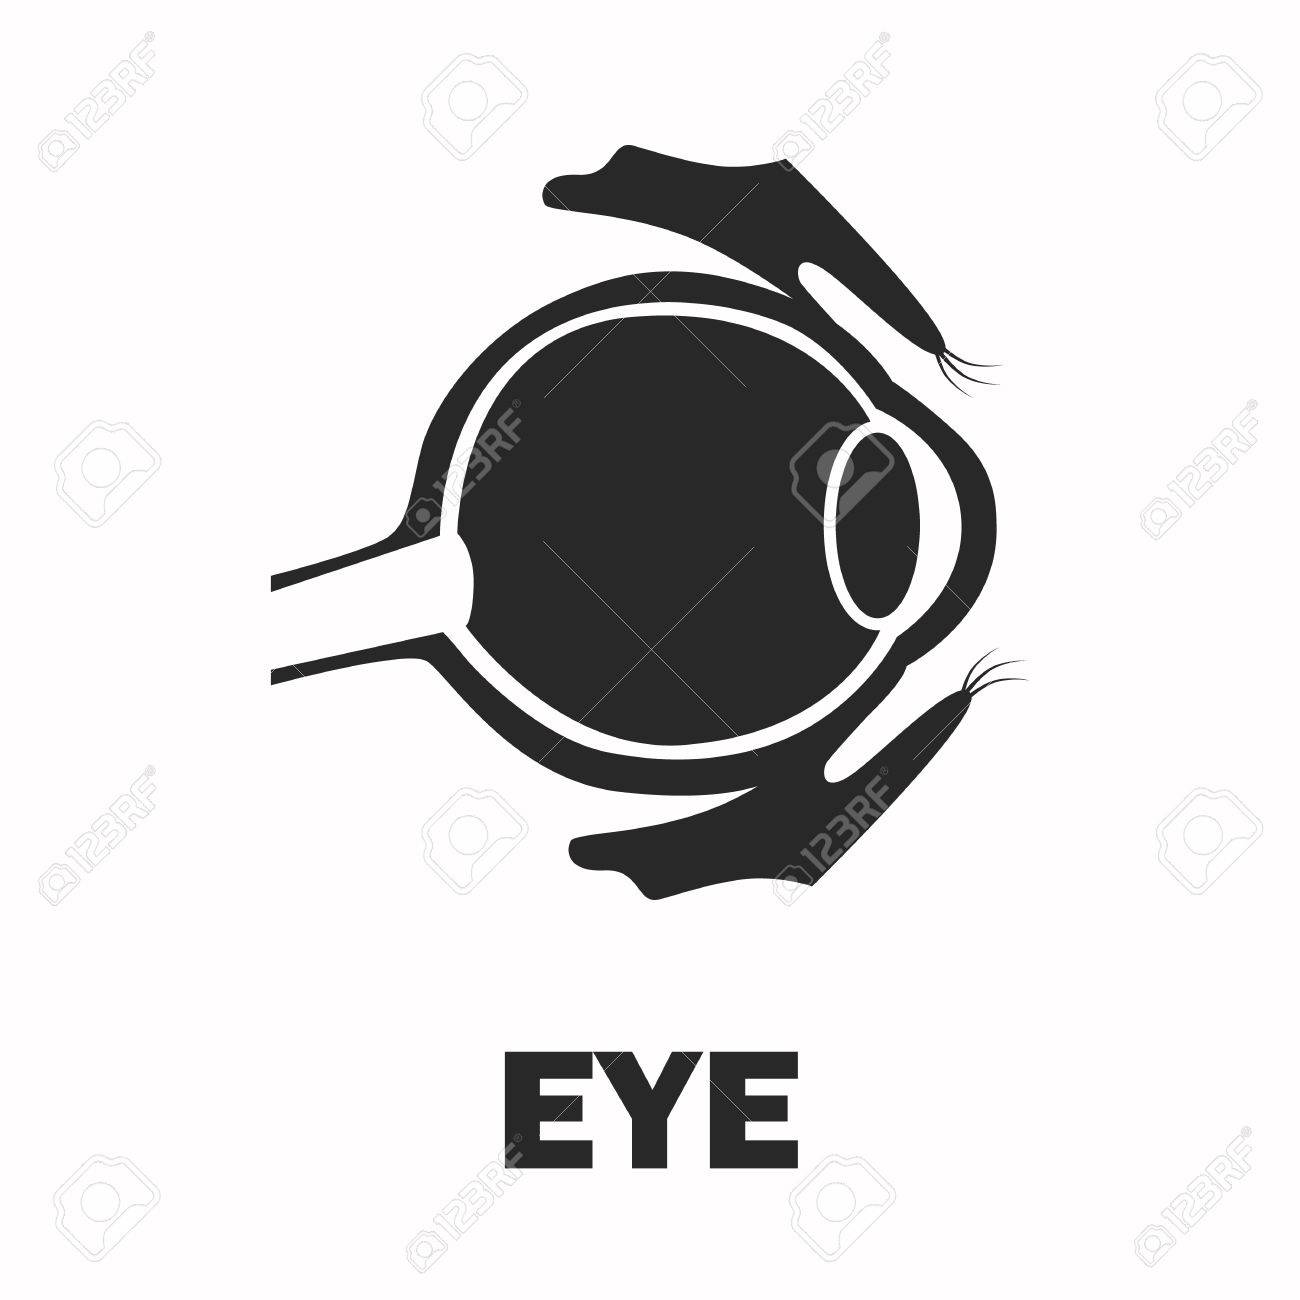 Human eyeball black icon - 61469918